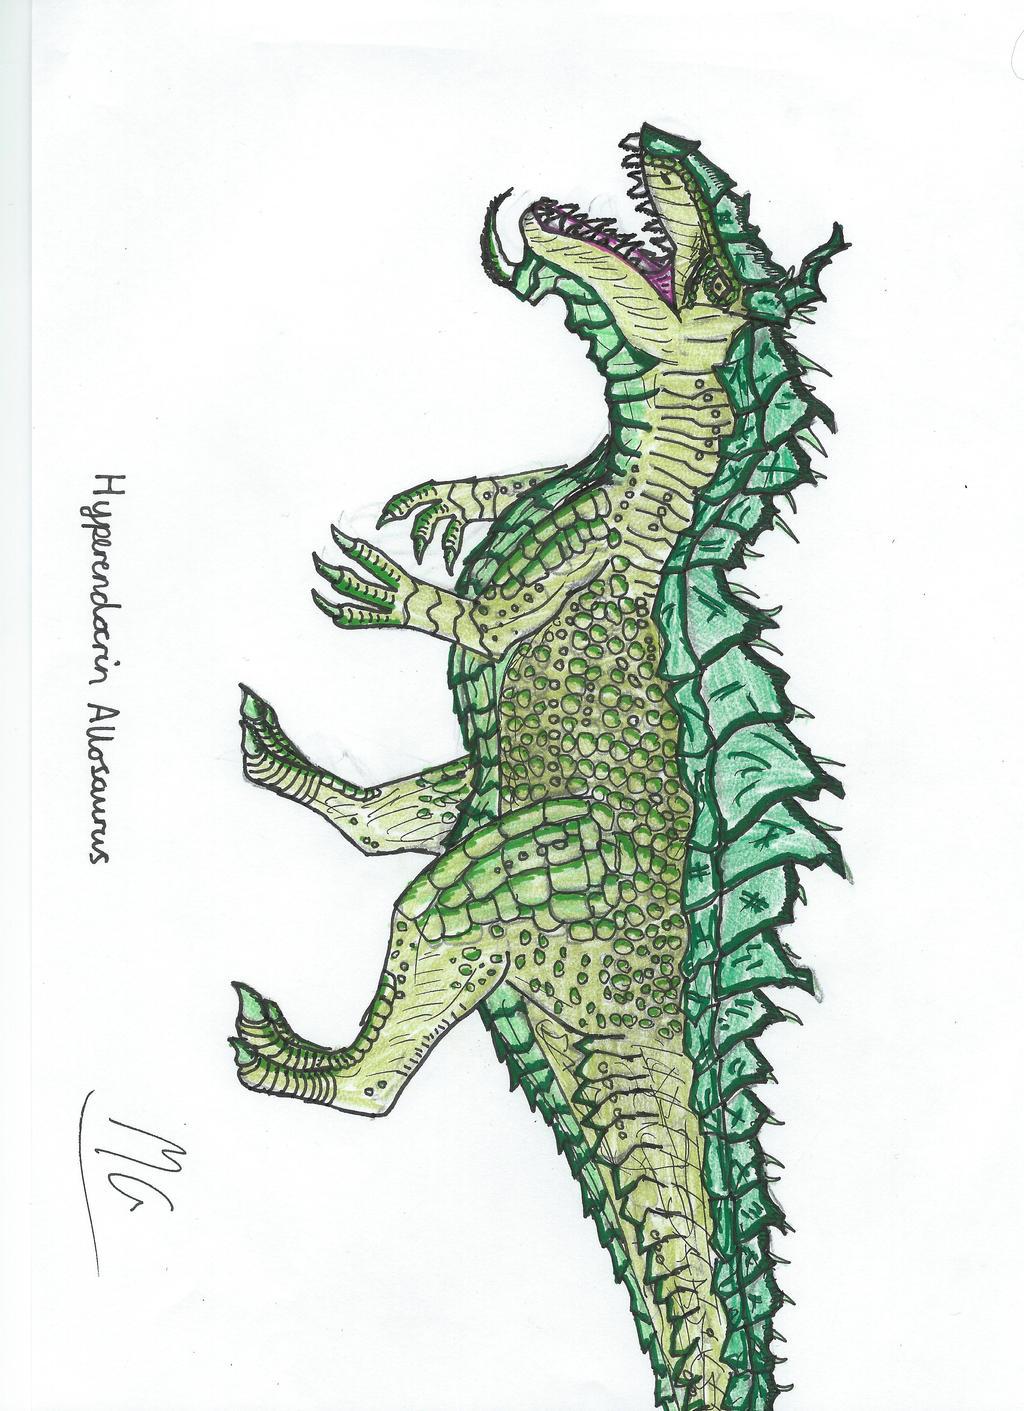 Hyperendocrin Allosaurus by Mgcroco